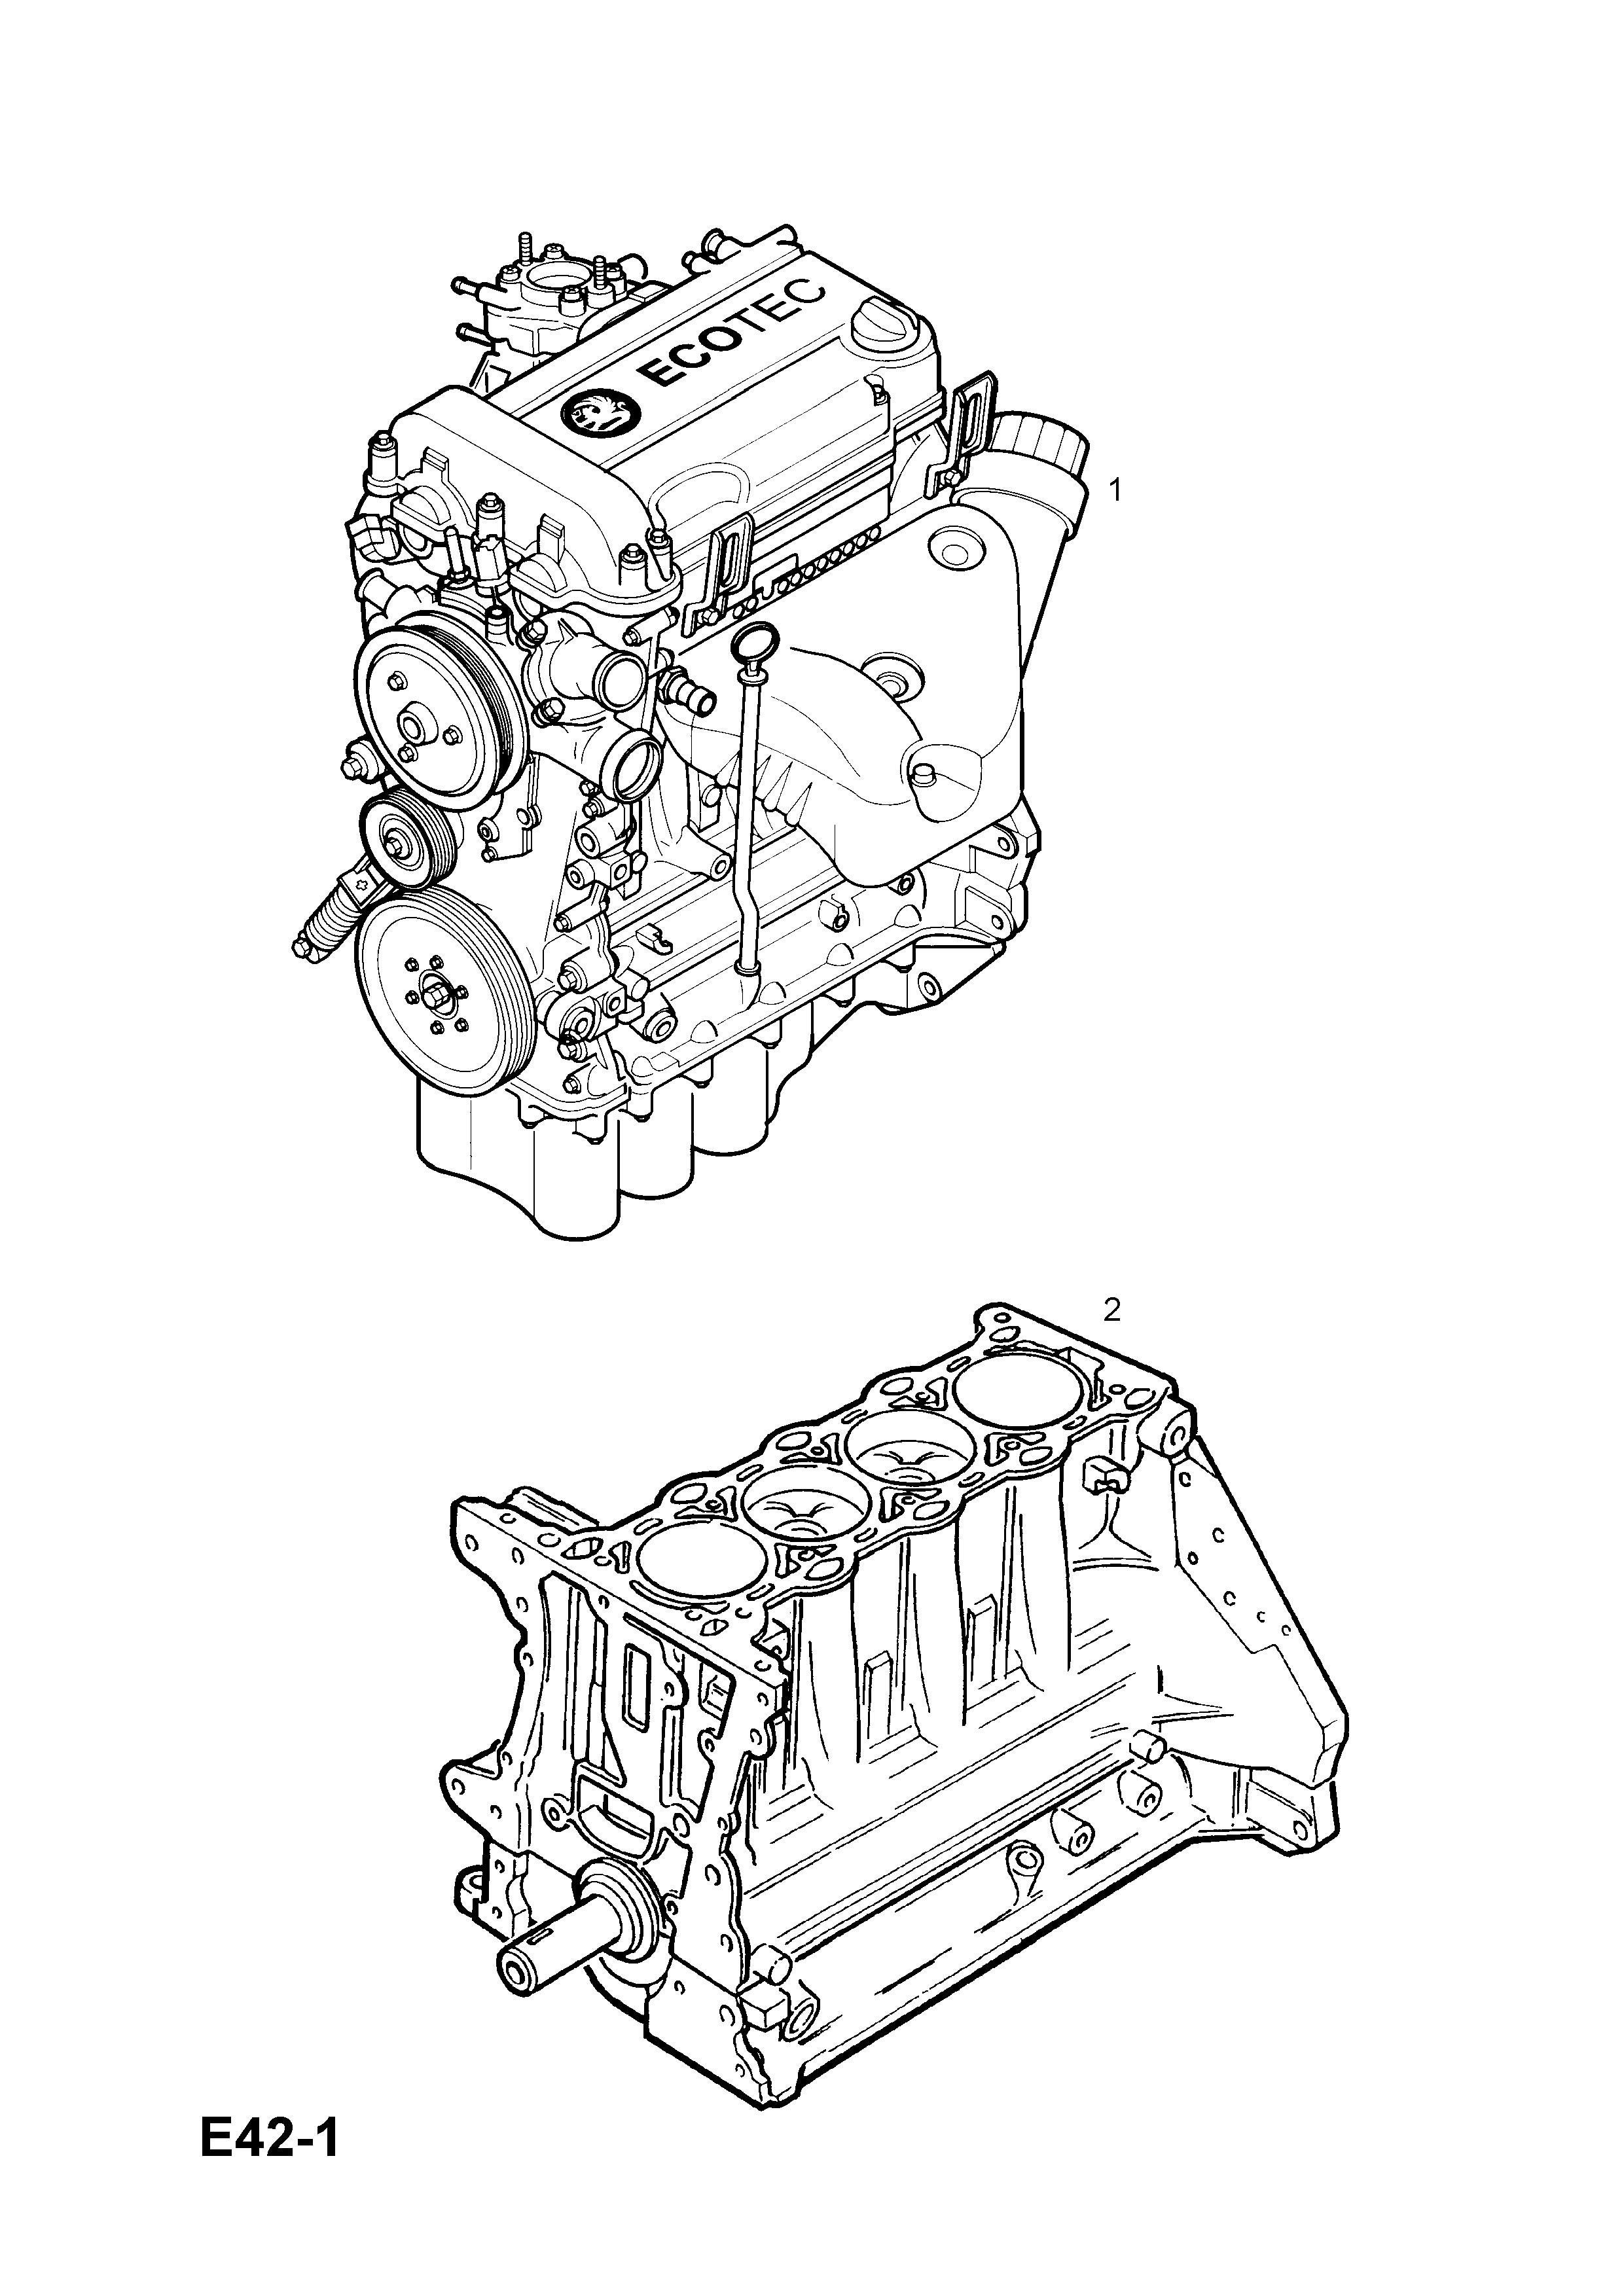 Vauxhall Corsa C 2001 E Engine And Clutch 4 Z14xeplj2 Gm Ecotec Diagram Part Number Genuine Description Range Short Motor